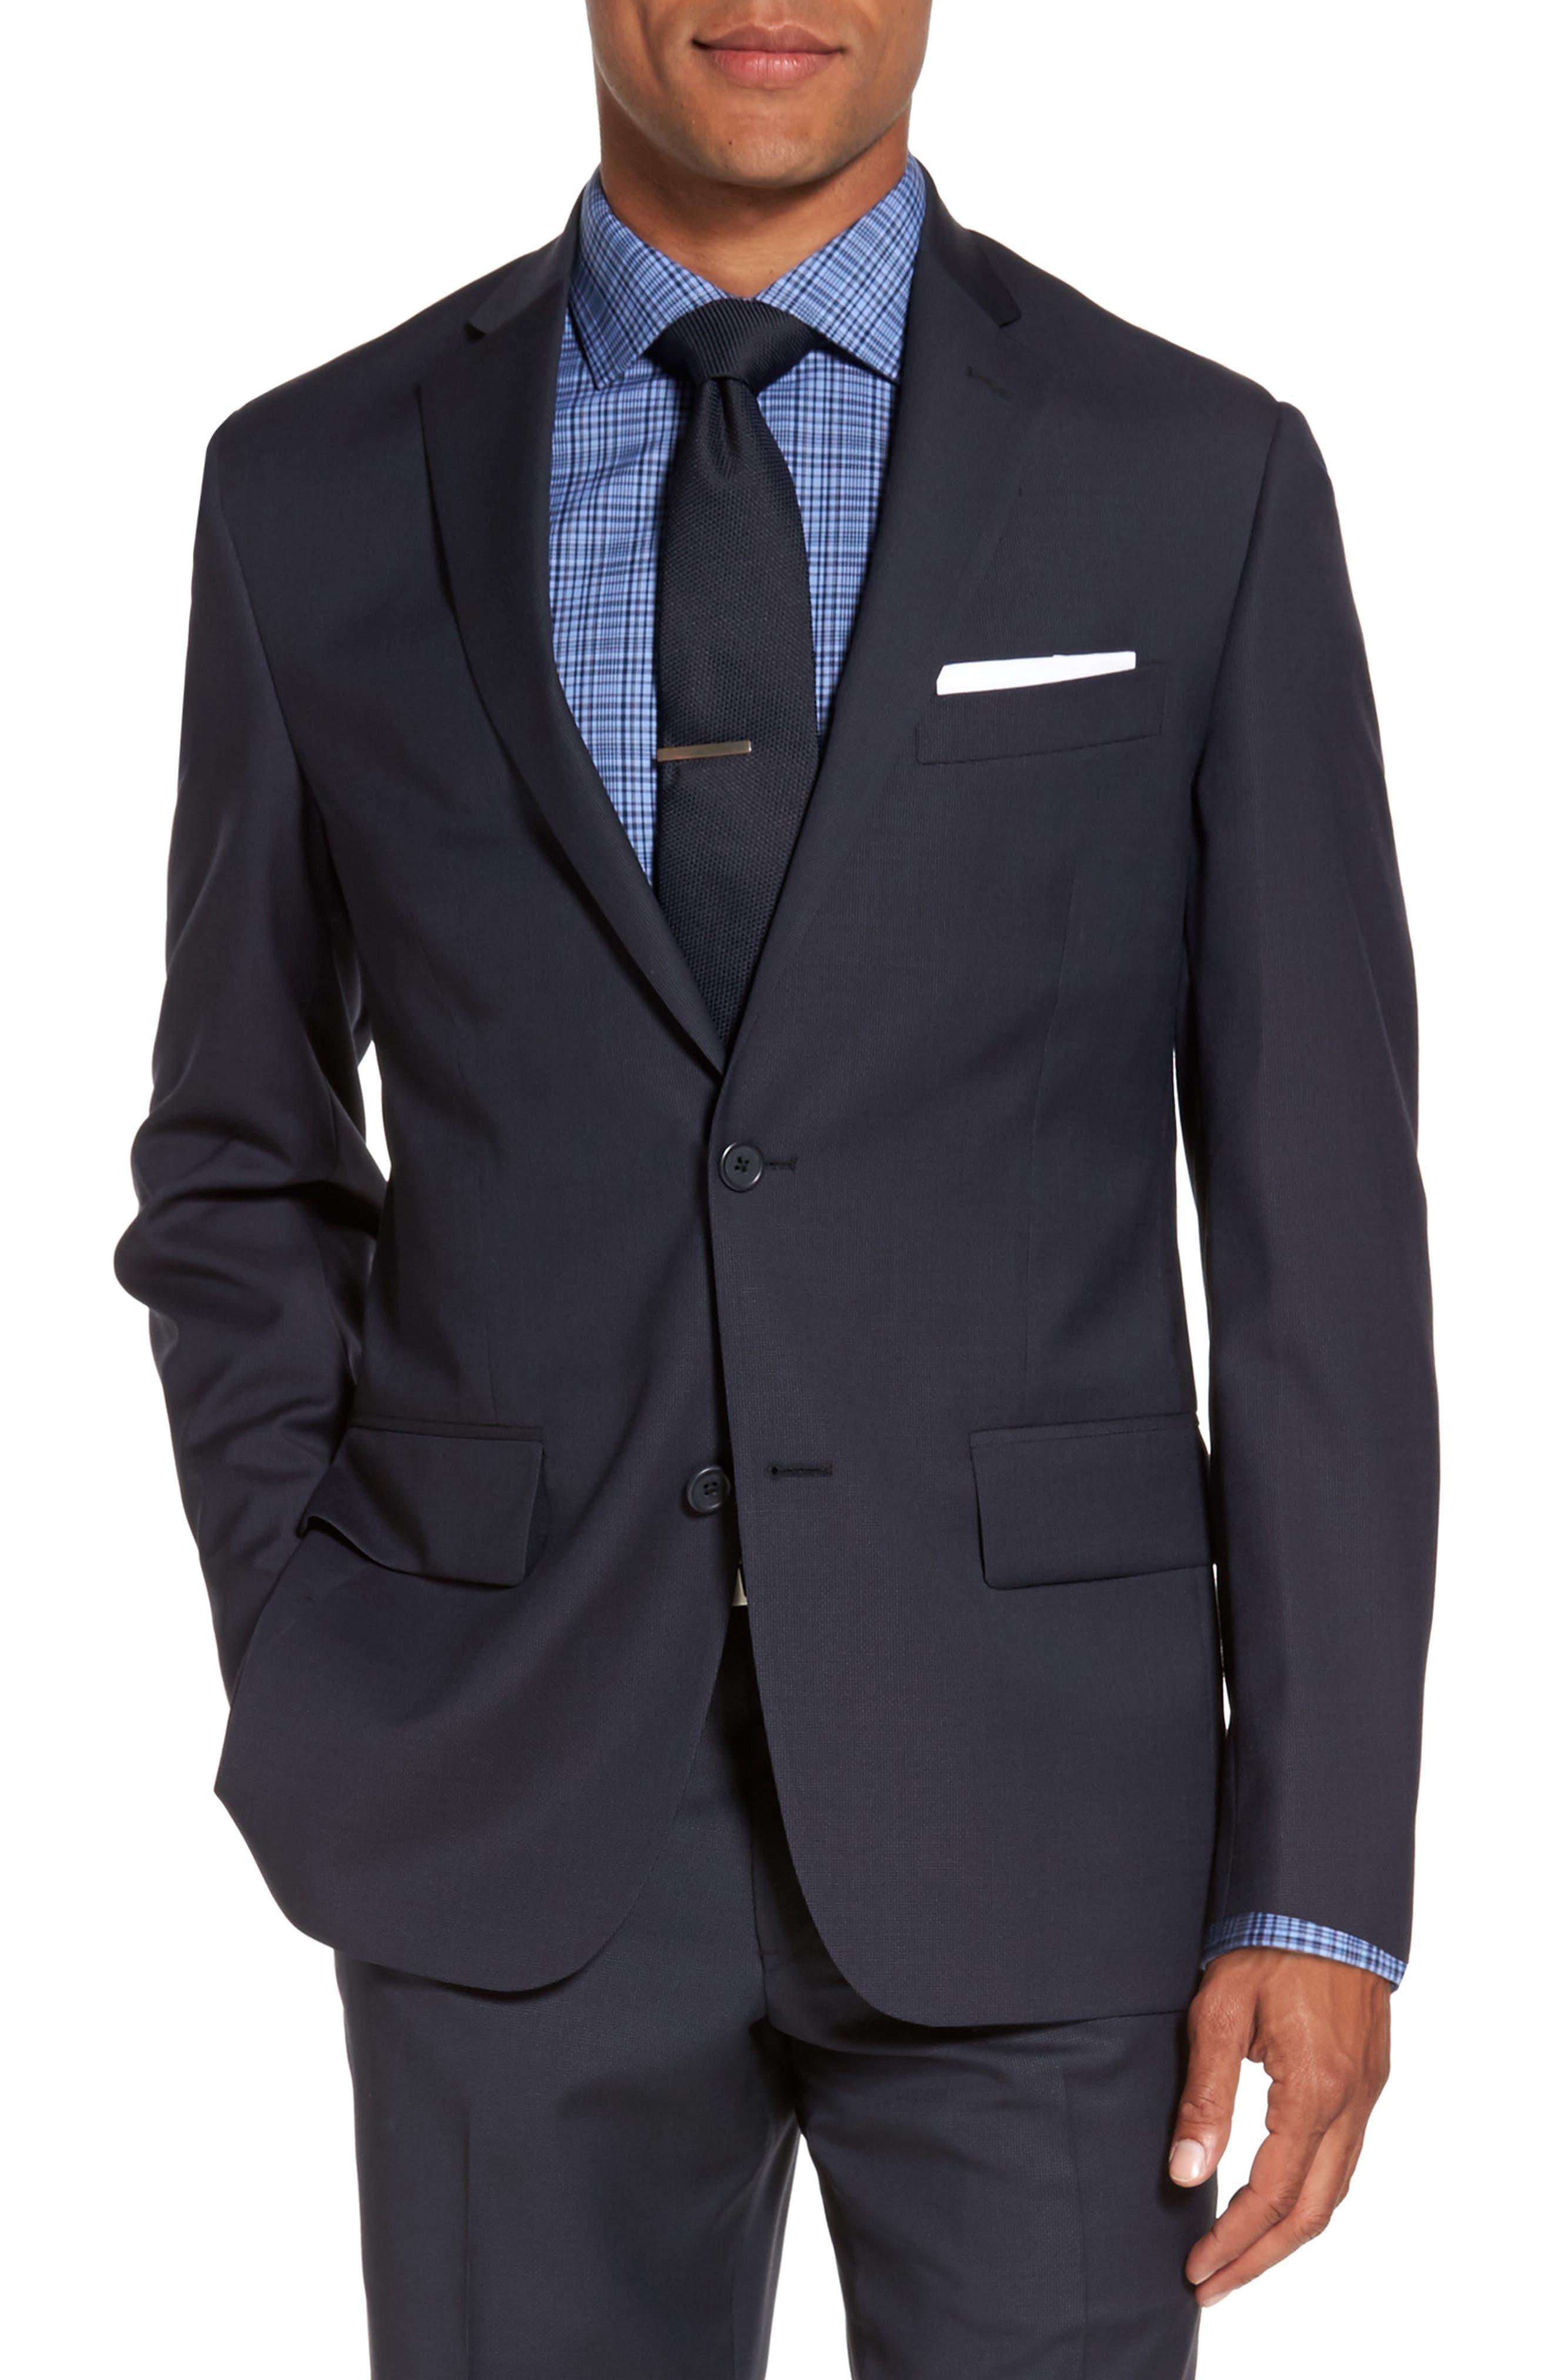 Nordstrom Men's Shop Classic Fit Tonal Check Wool Suit Jacket (Big & Tall)